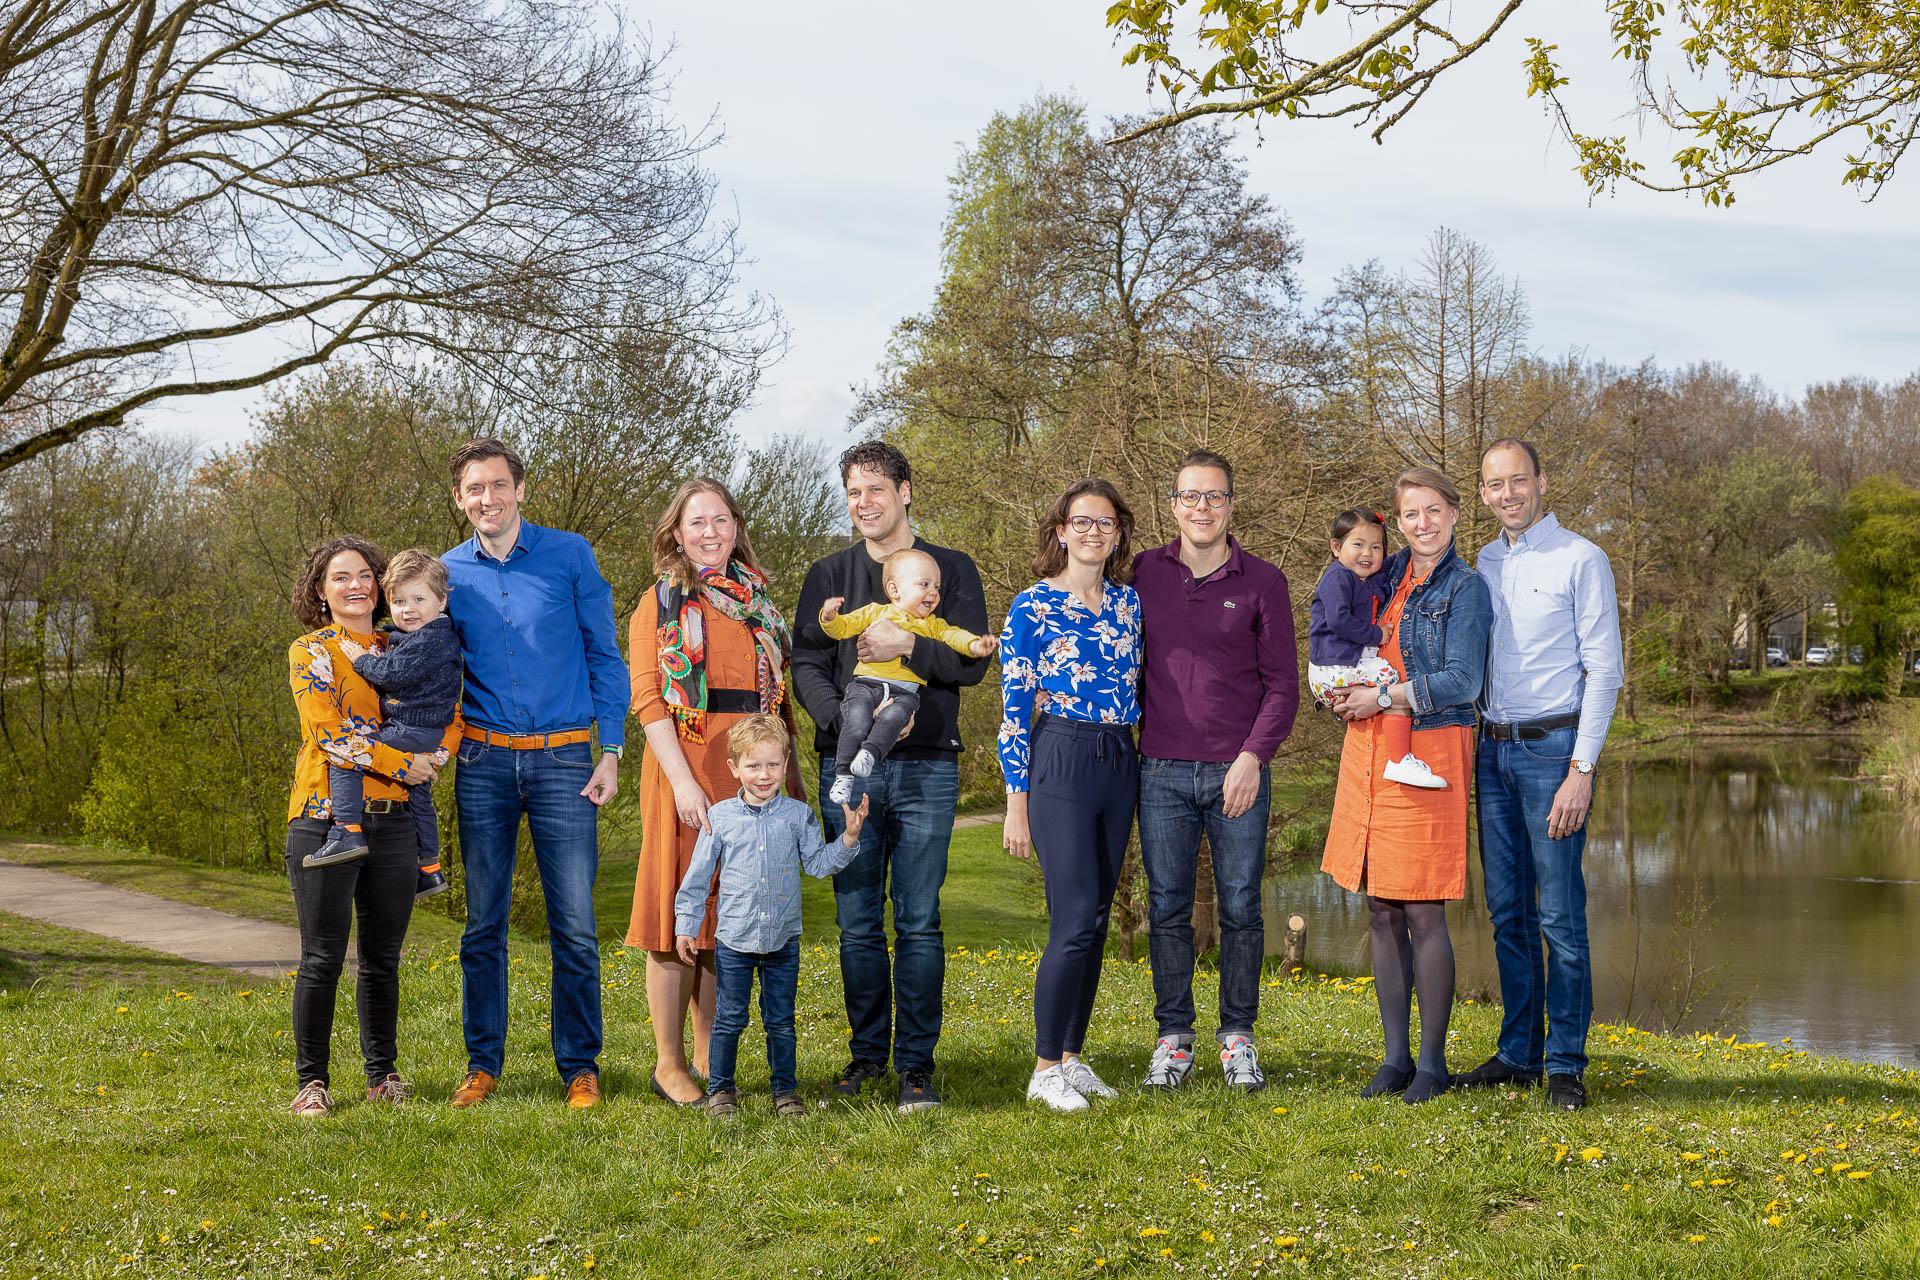 Coronaproof groepsfoto, familiefoto, volledig veilig buiten gemaakt, corona-proof shoot